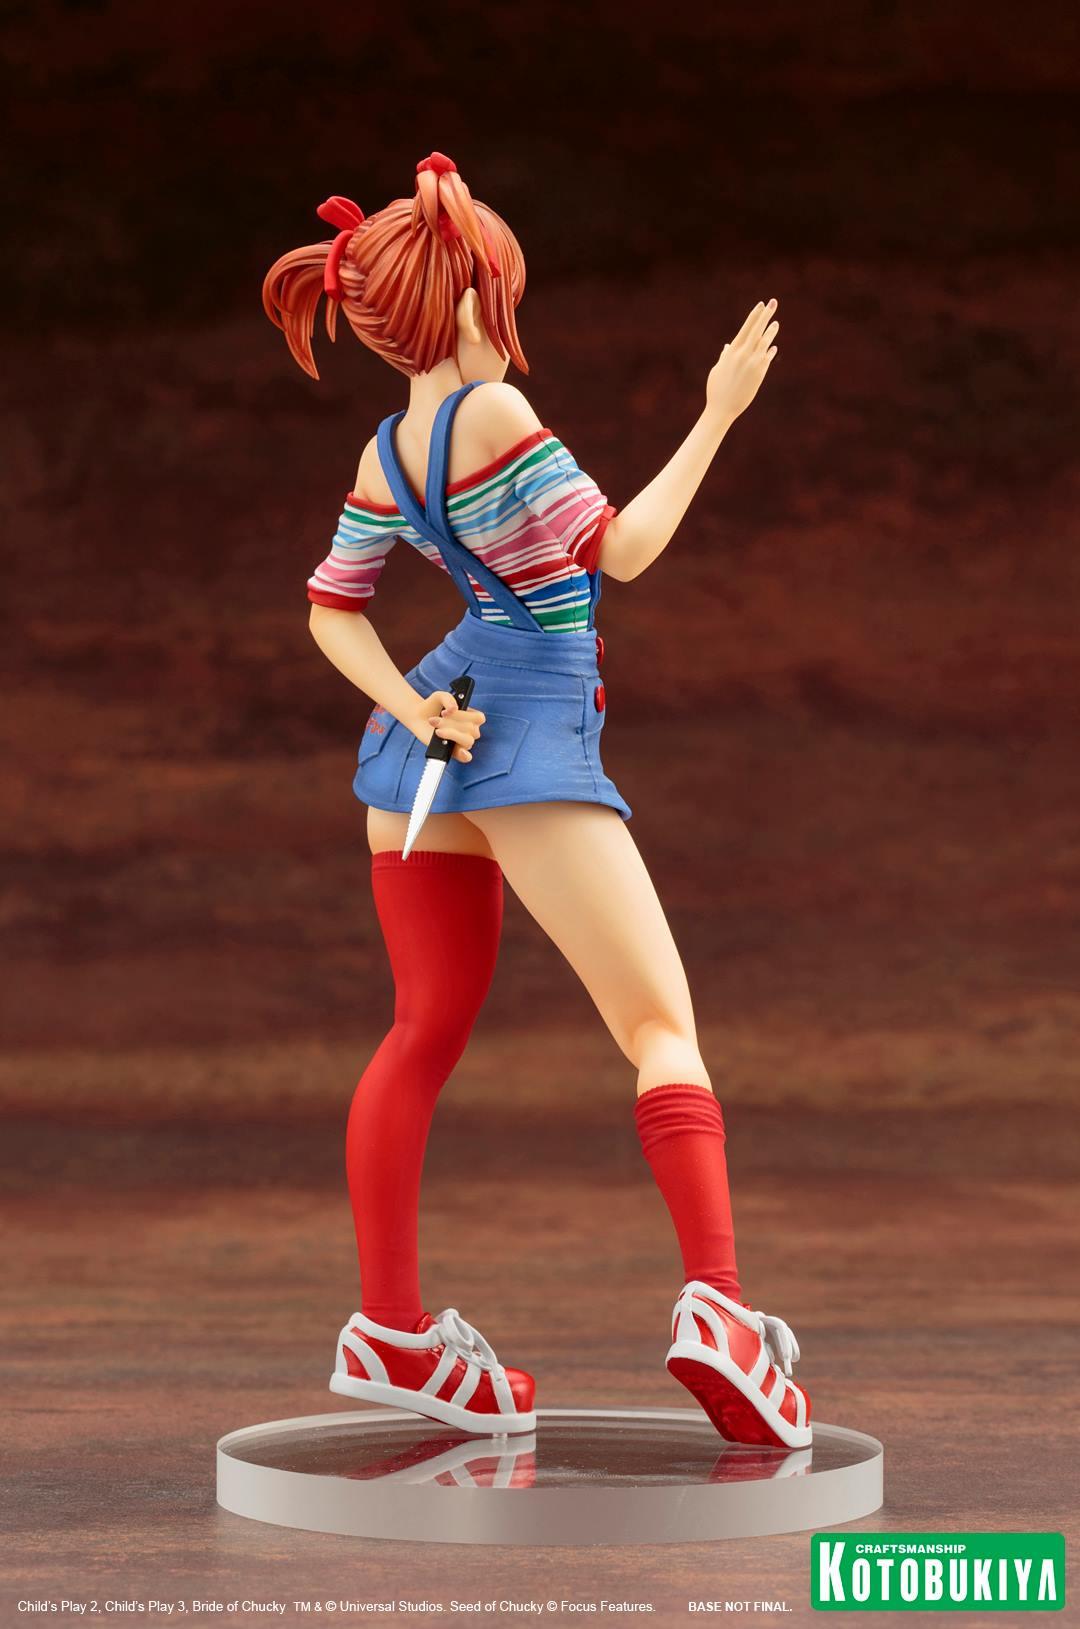 childs-play-chucky-bishoujo-statue-kotobukiya-3a